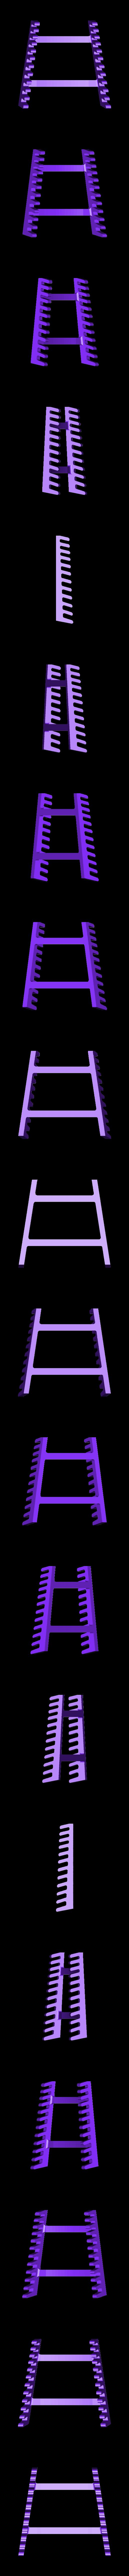 jokerHolder.stl Télécharger fichier STL gratuit Porte-clef Wera Joker • Plan à imprimer en 3D, robC